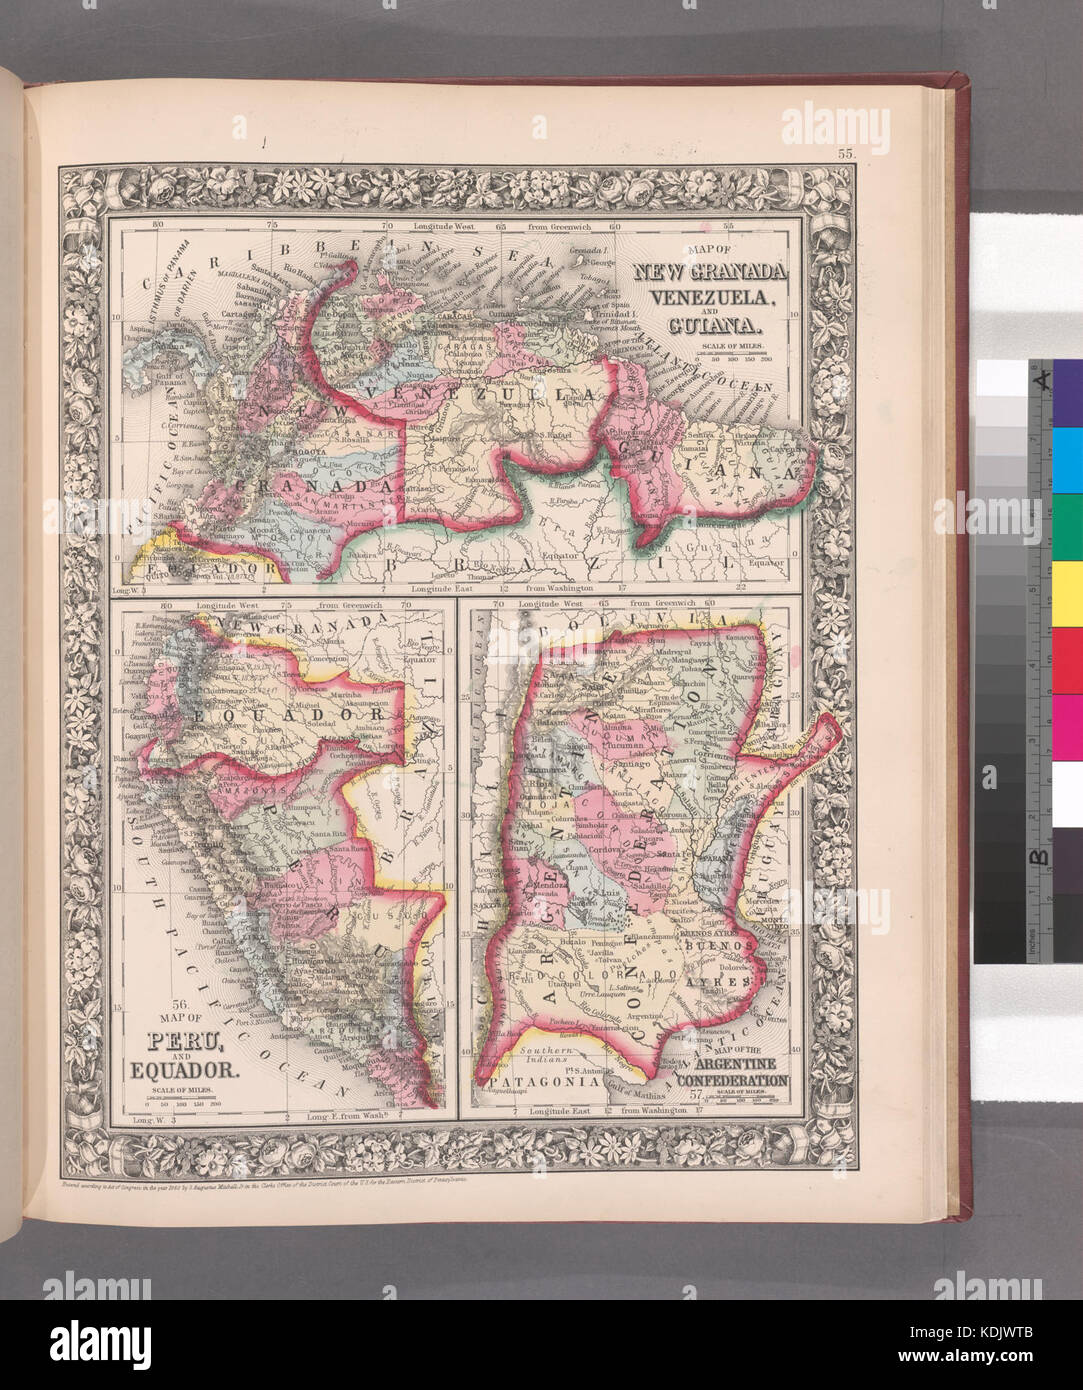 Old Map Of Grenada Stock Photos Old Map Of Grenada Stock Images - Grenada atlas map